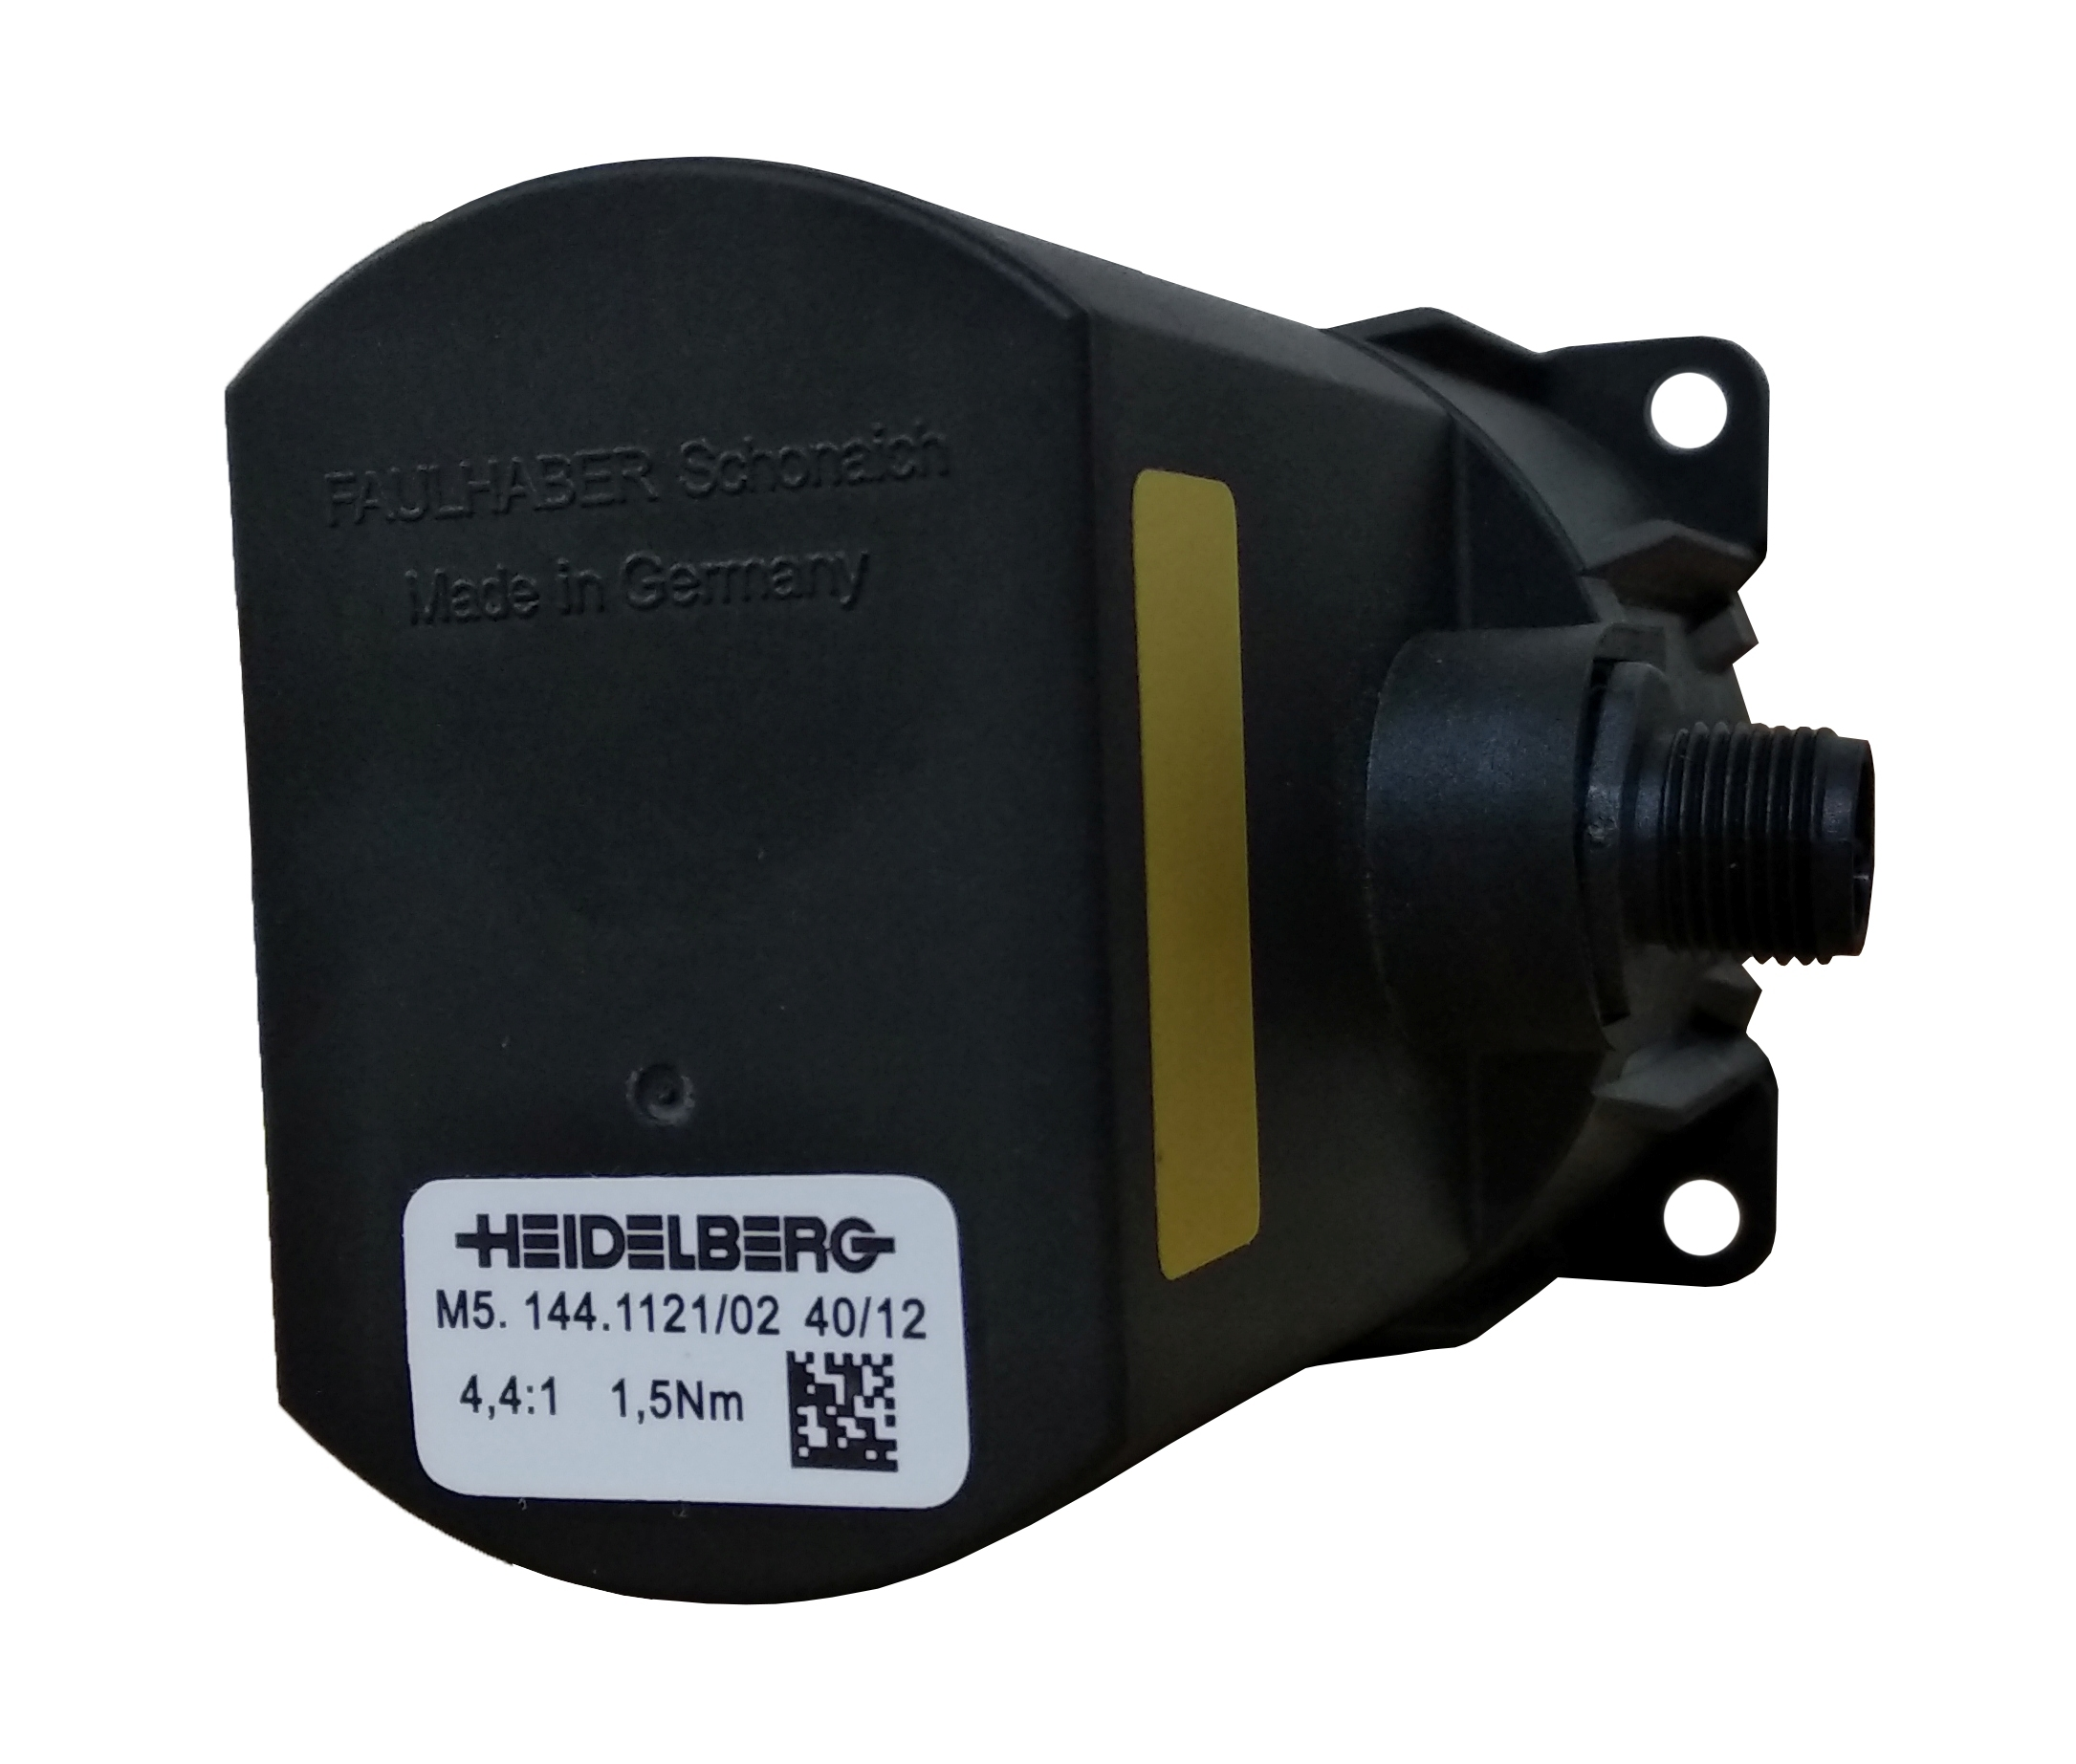 Motor - M5.144.1121